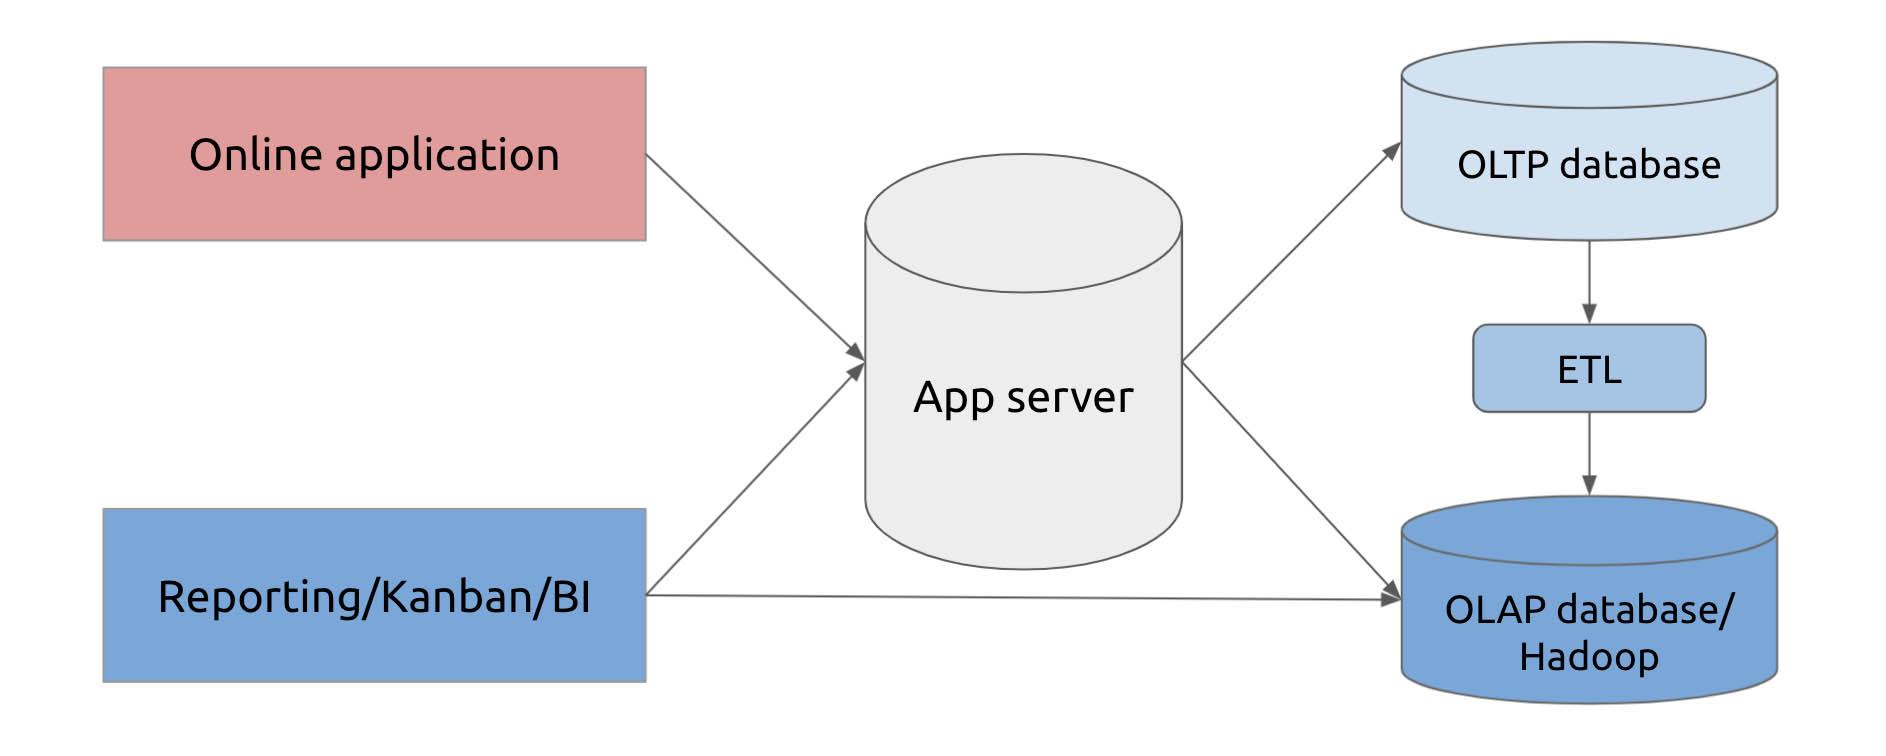 A traditional hybrid workload scenario